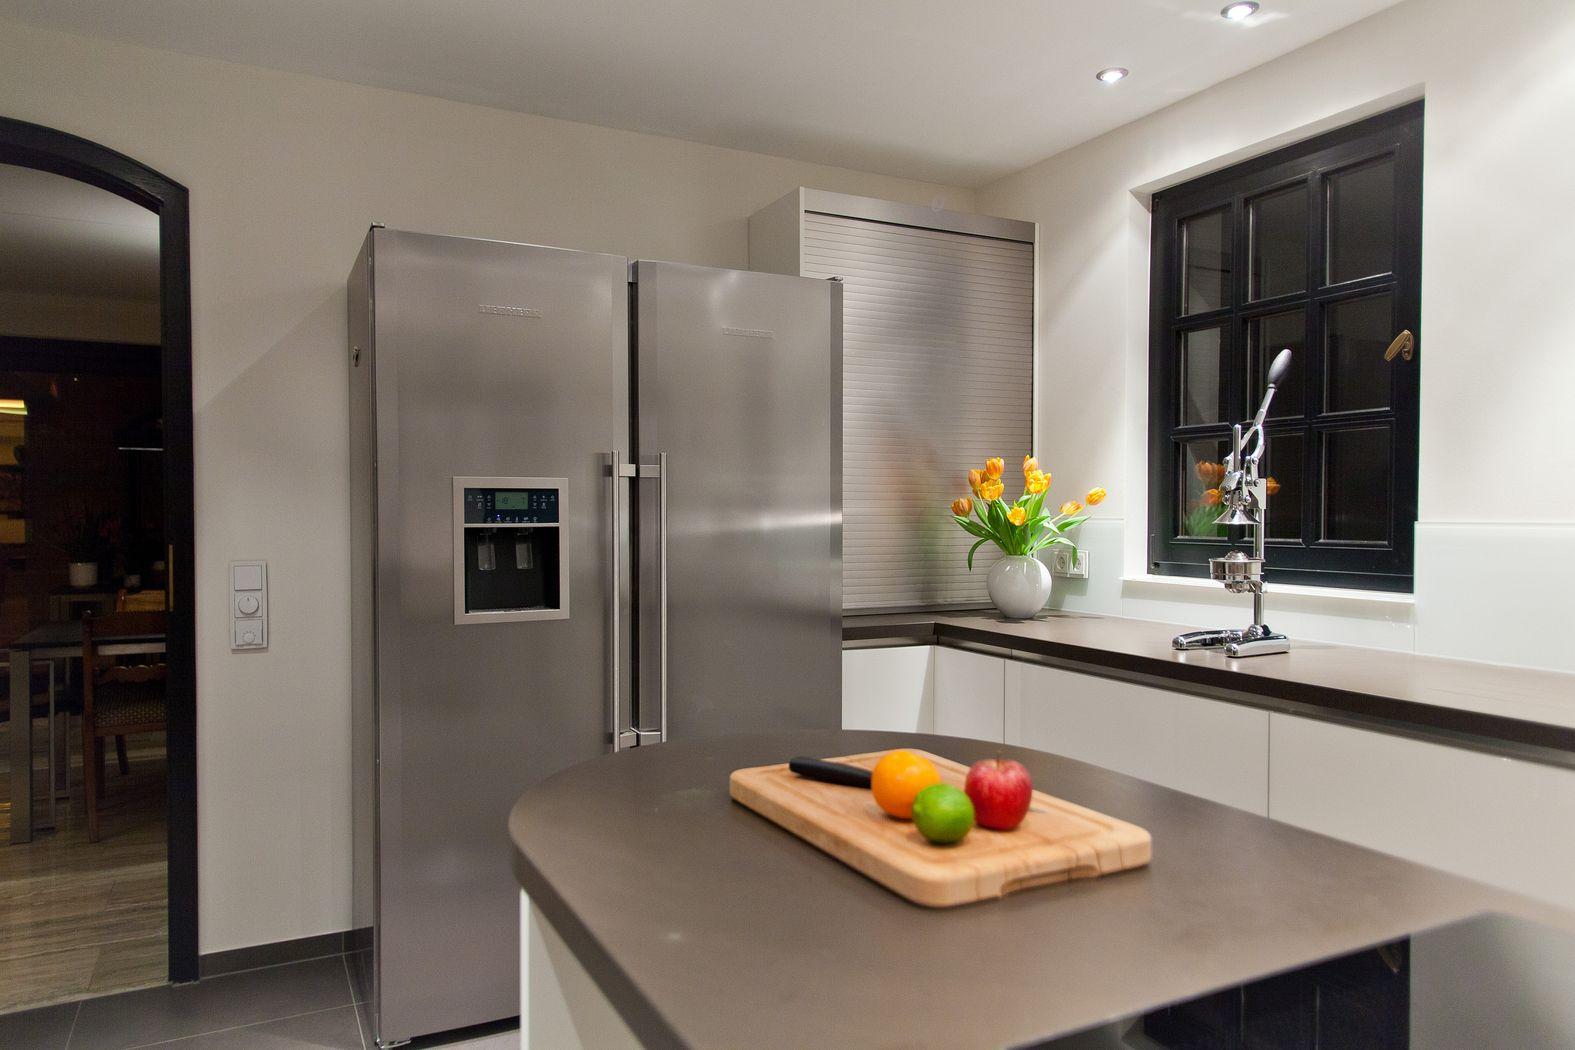 Awesome Küchen Luxus Design Contemporary - Ridgewayng.com ...